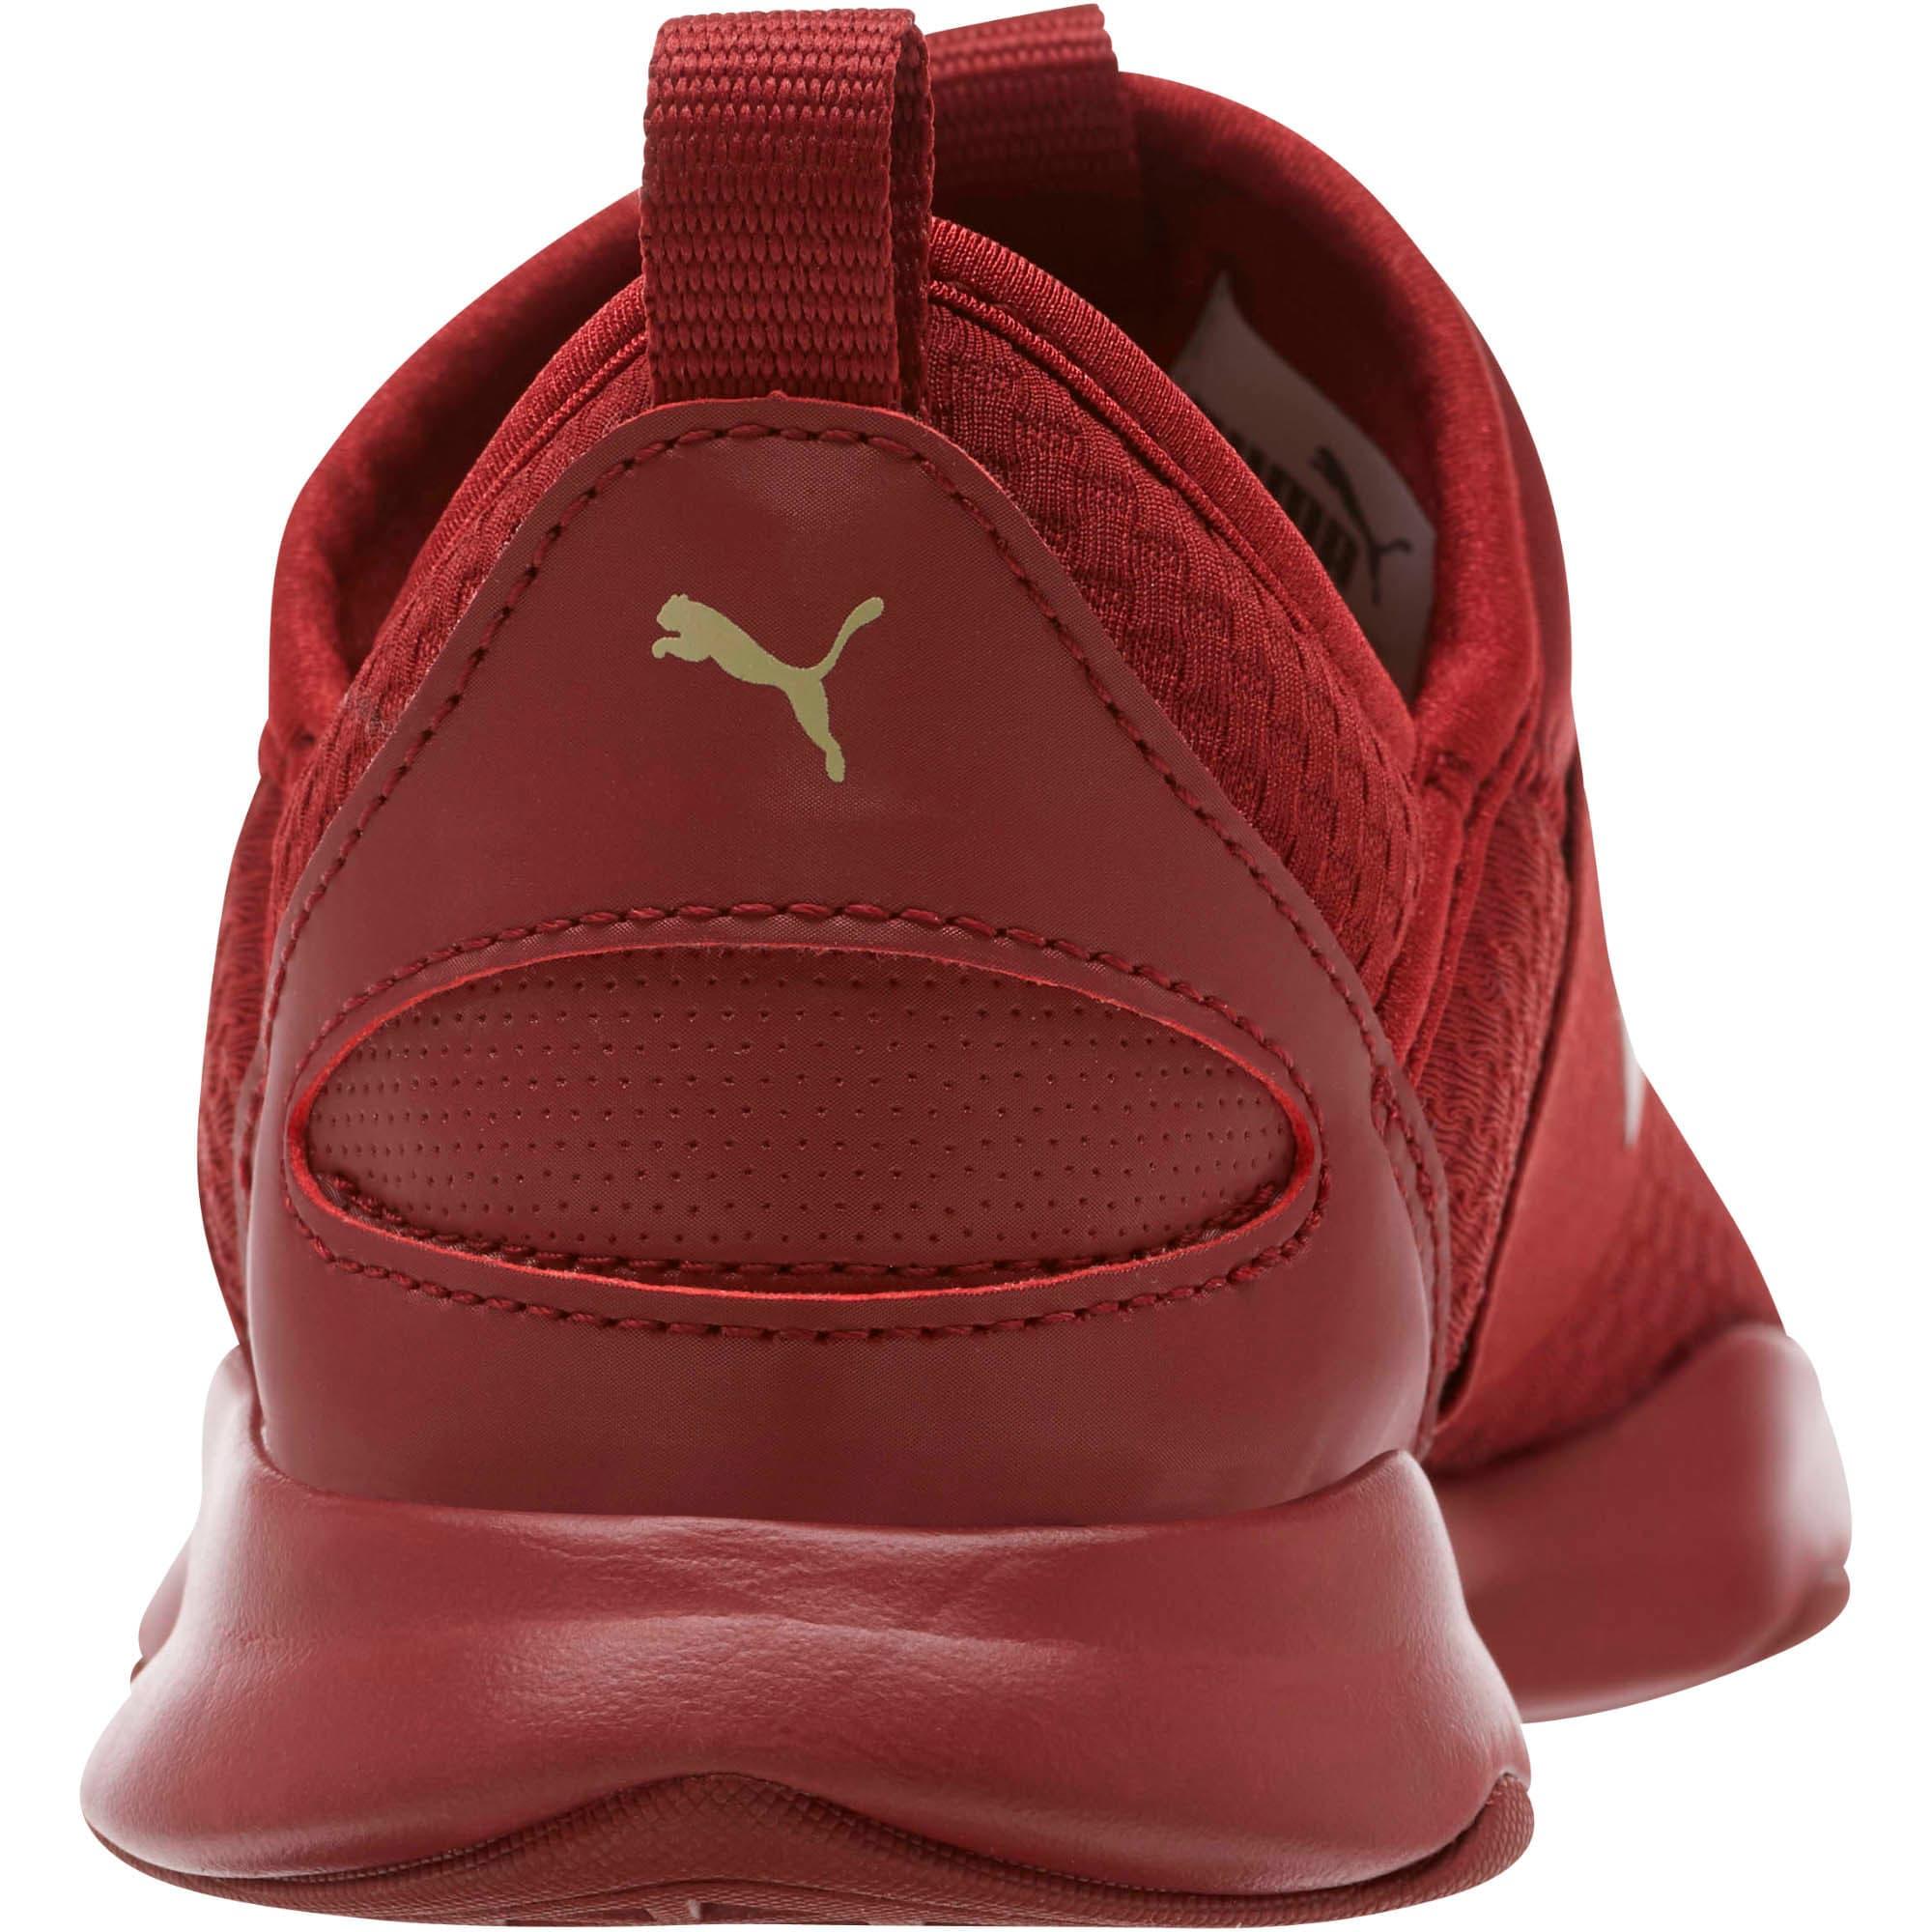 Thumbnail 4 of Dare En Pointe Women's Shoes, Pomegranate-Metallic Gold, medium